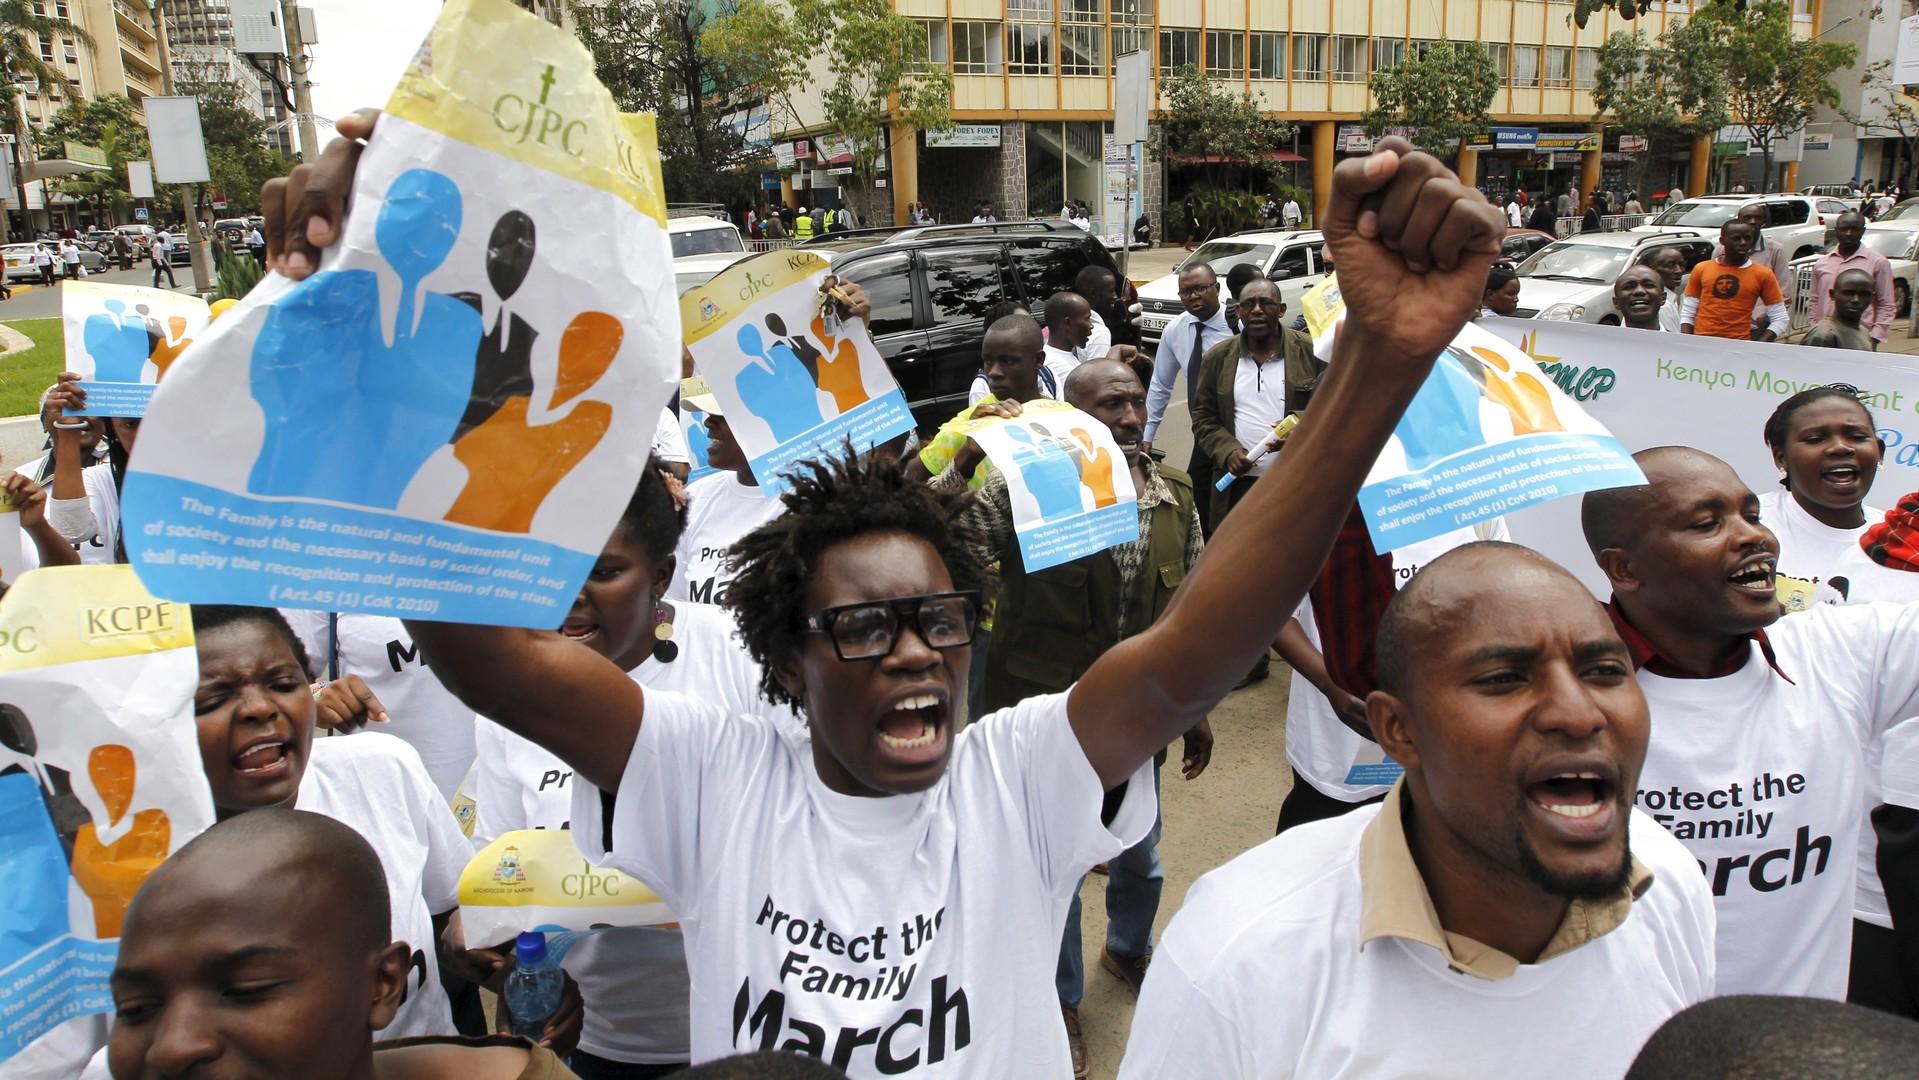 Des manifestants anti-gay au Kenya